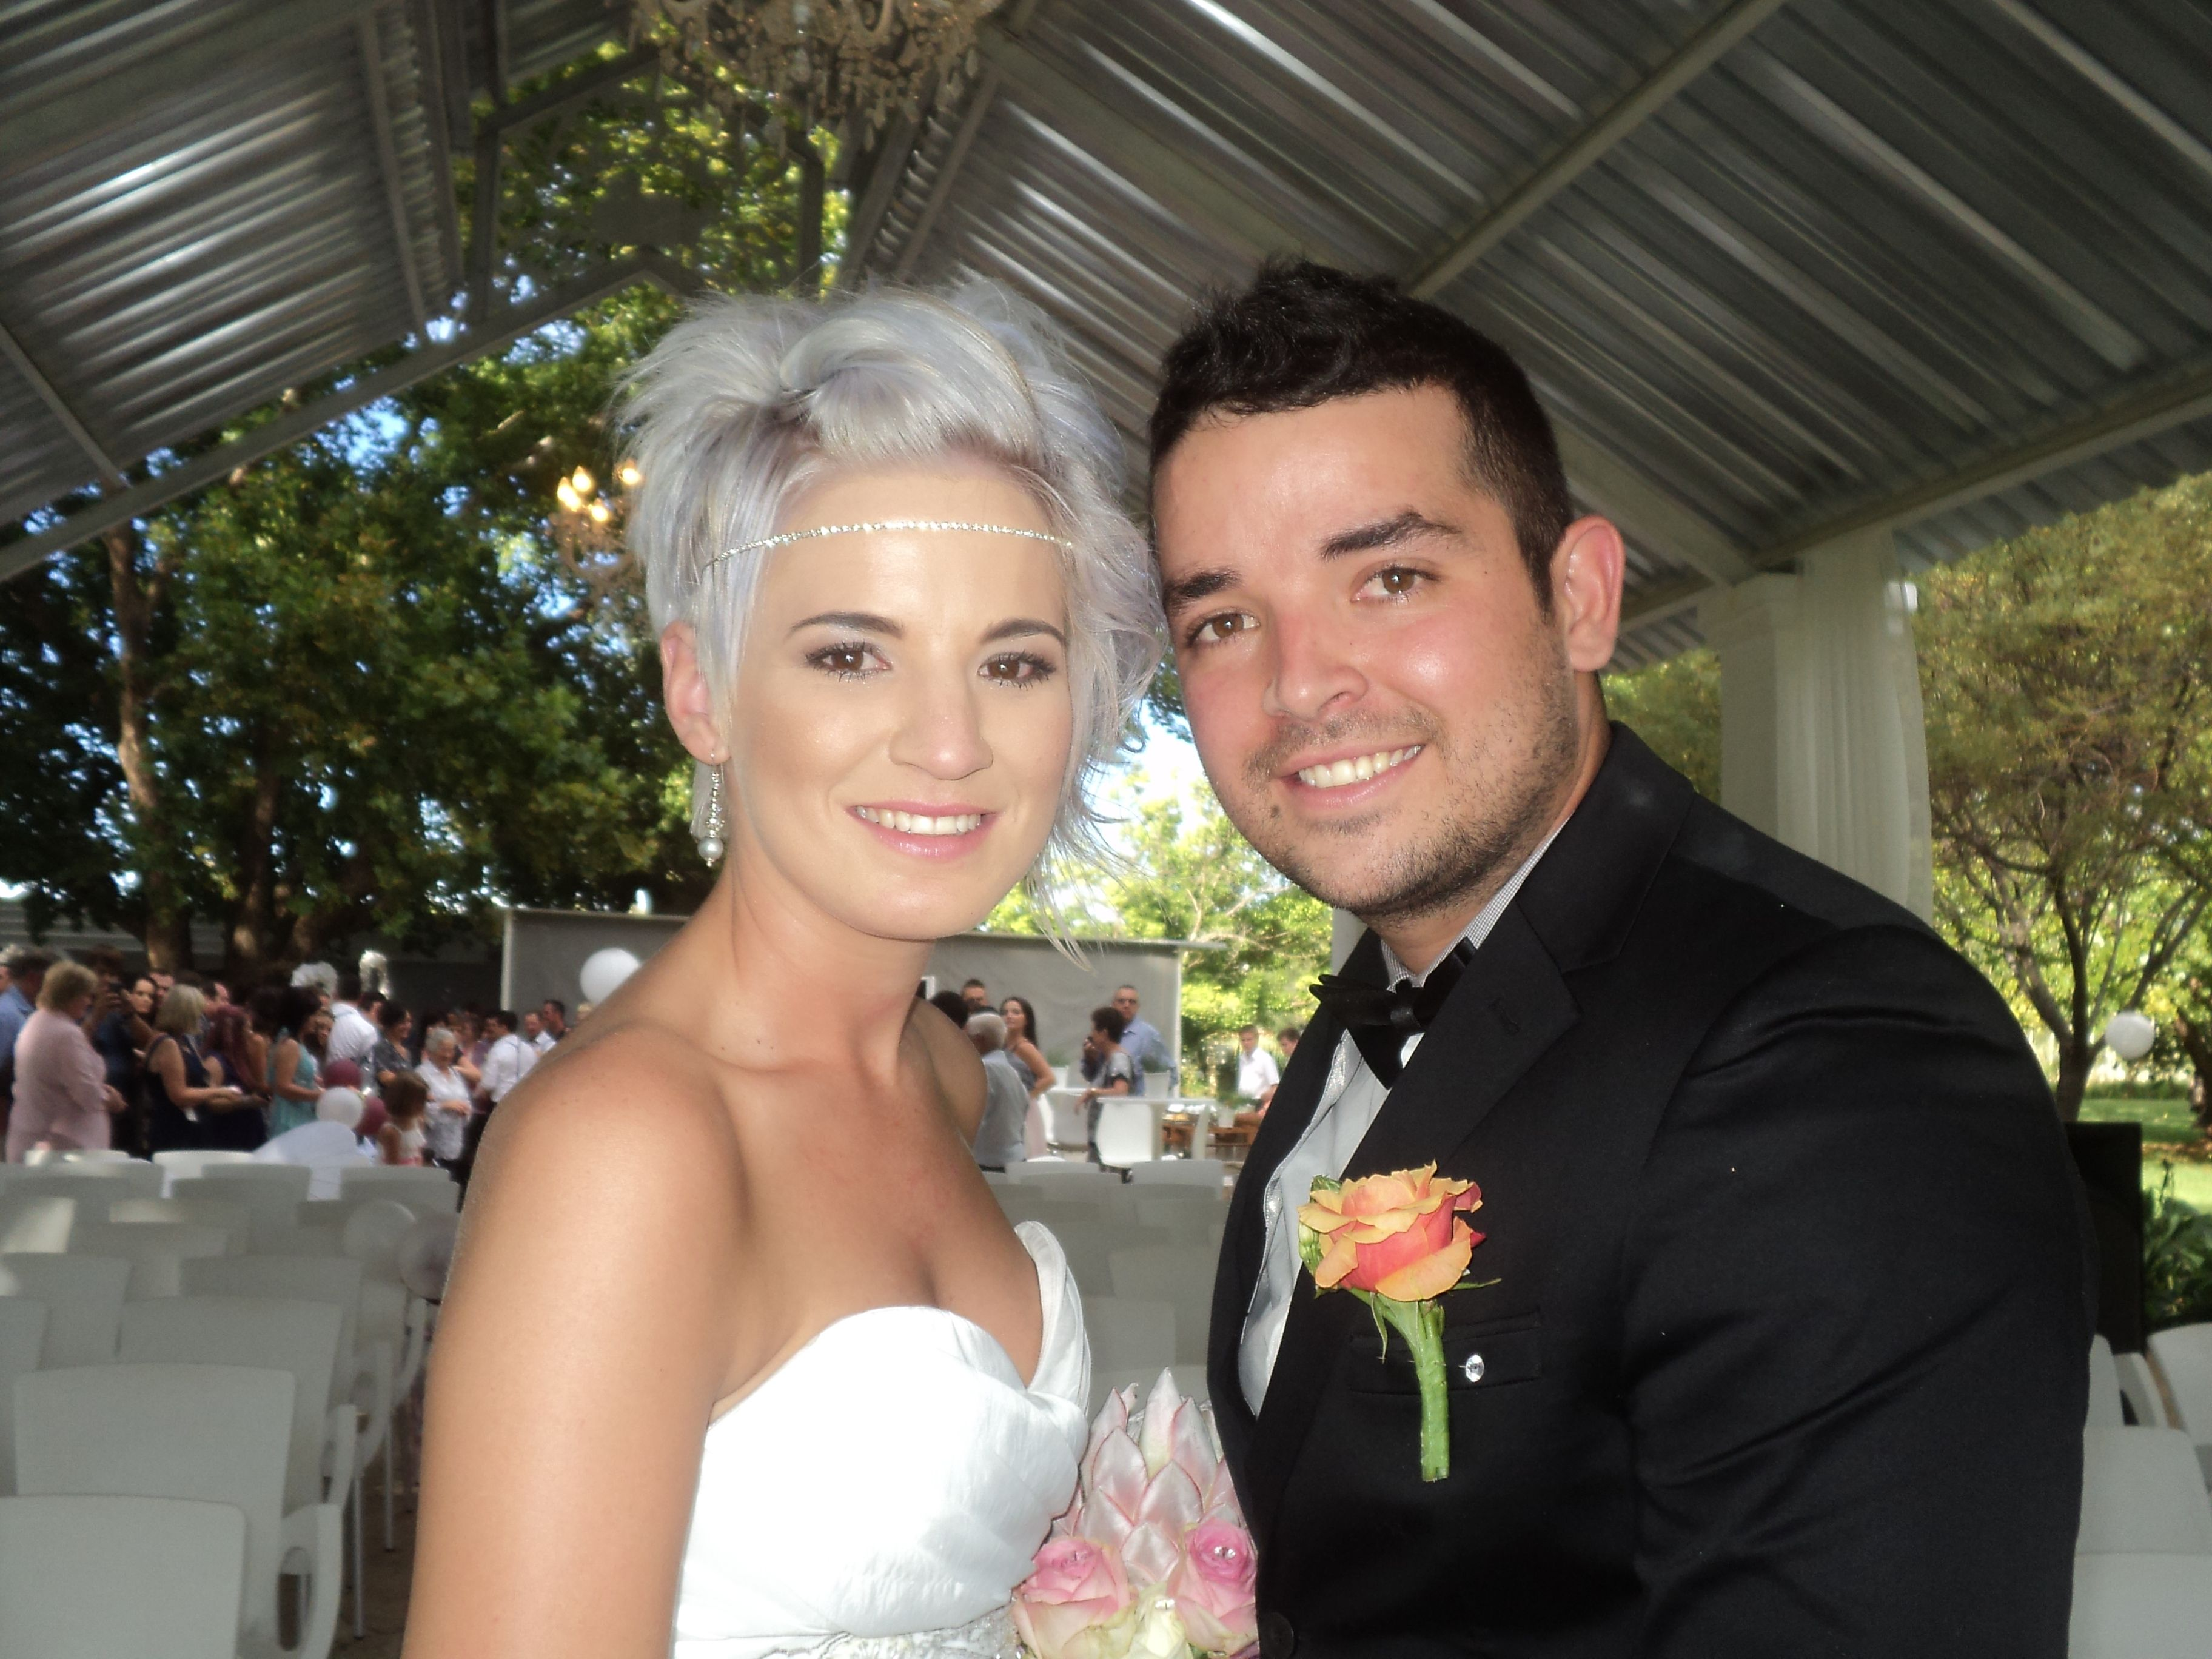 My cousin's wedding<3